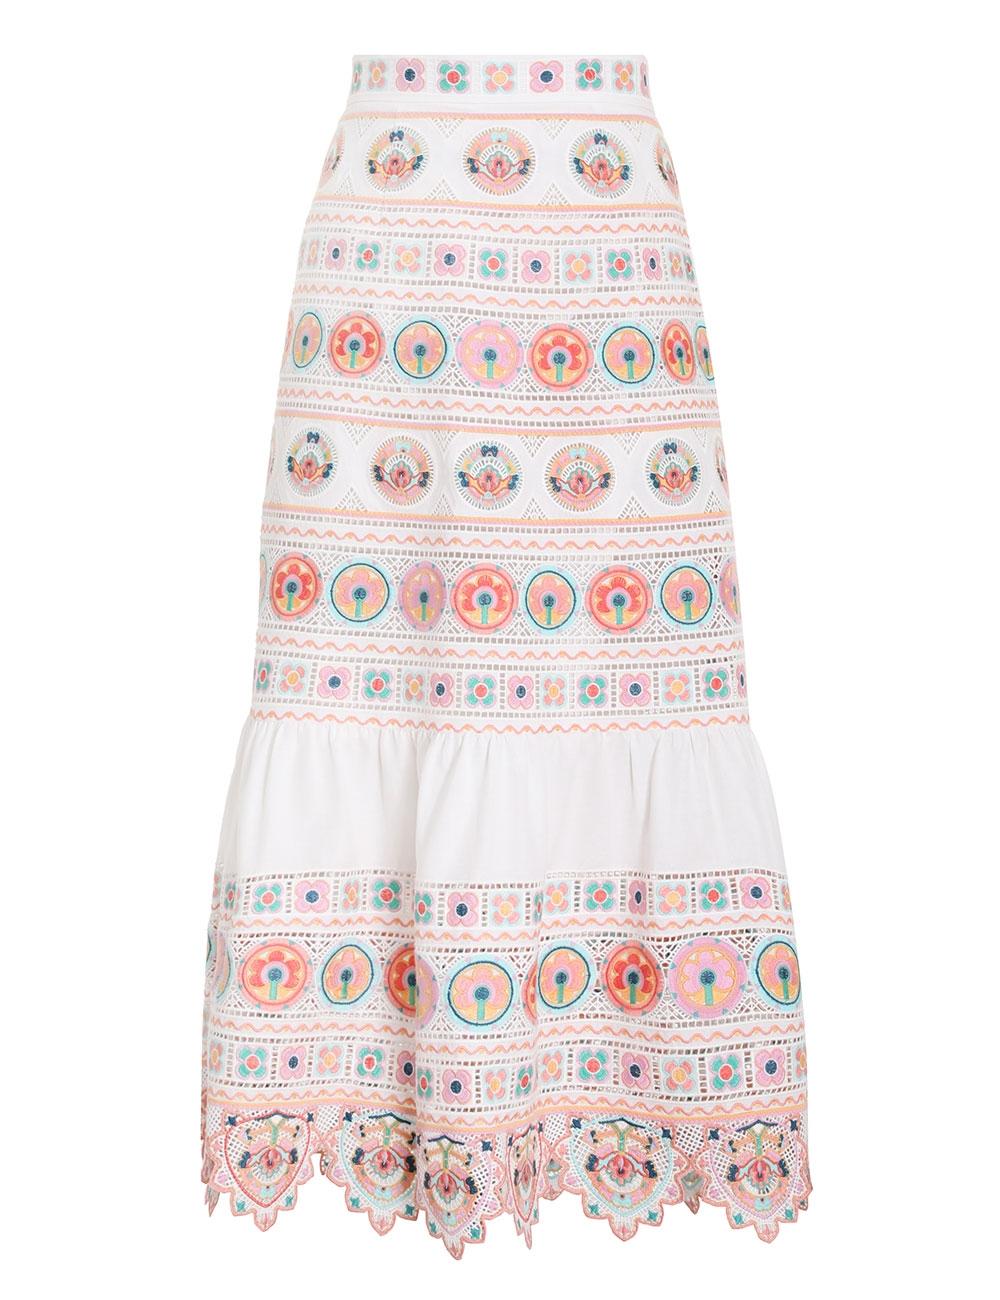 Brighton Embroidered Skirt